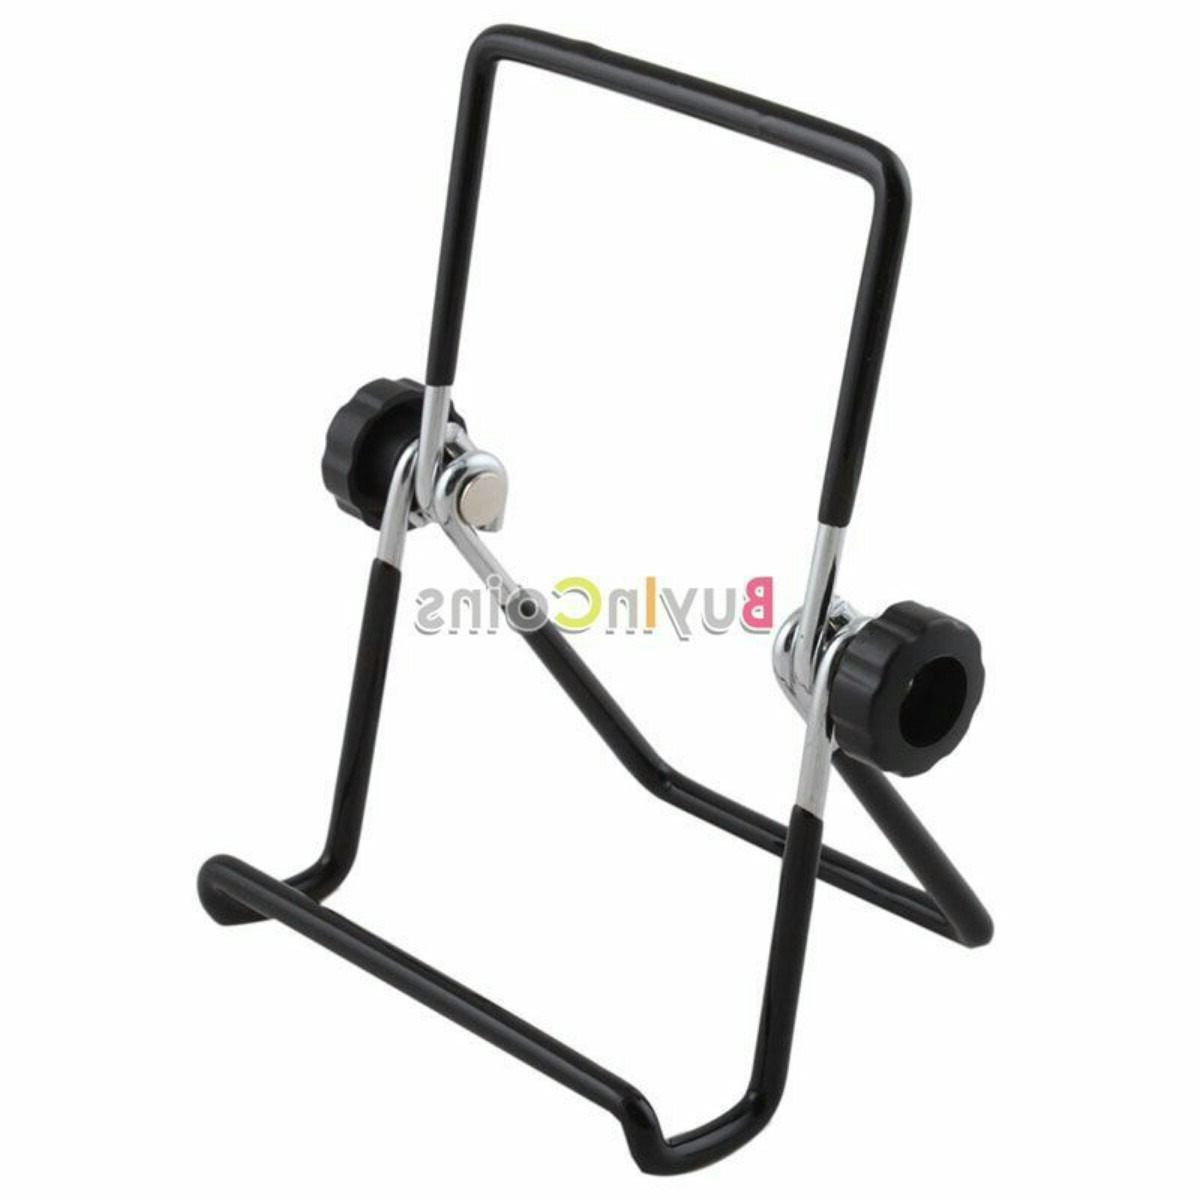 Atril Para Tablet O2d5 soporte Para Tablet O Smartphone 4 000 En Mercado Libre